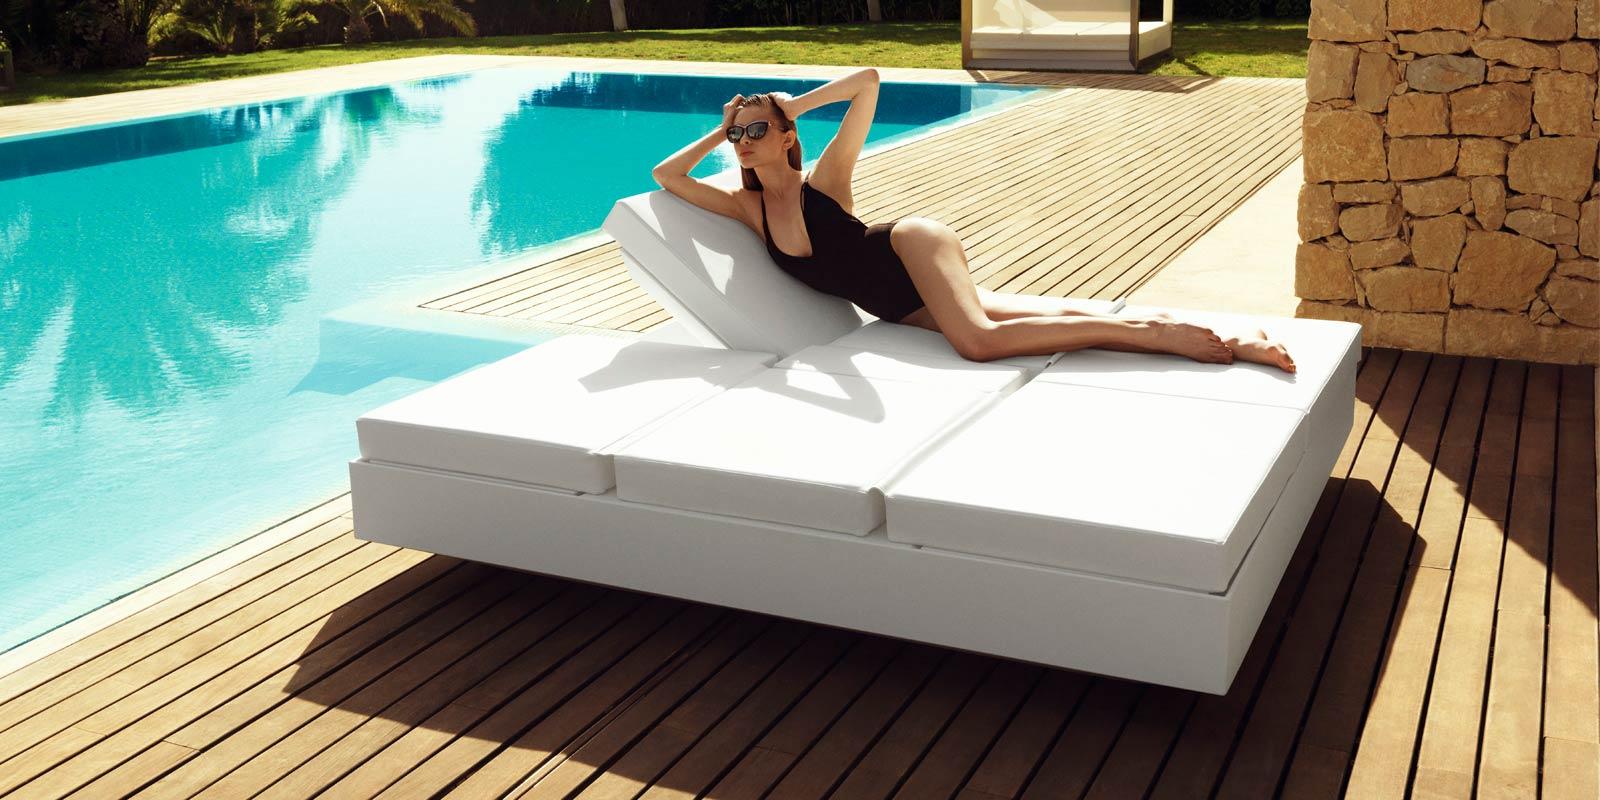 VONDOM-muebles-exterior-diseño-daybed-cama-de-dia-exterior-vela-ramonesteve-vondom_(9)